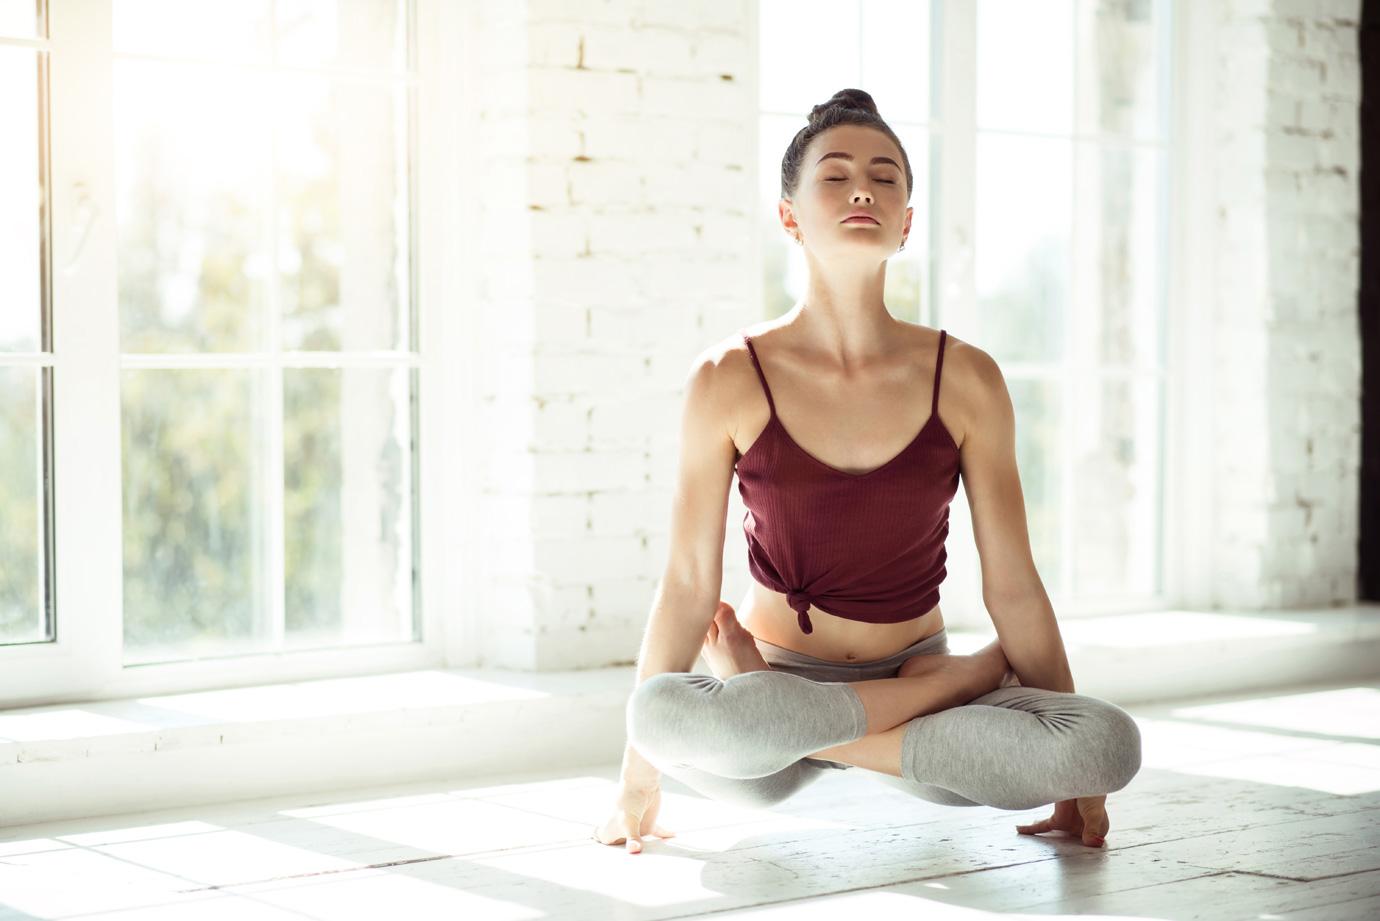 Testi e immagini per: meditazione, yoga, meditation, mindfulness, zen, buddhismo, spiritualità